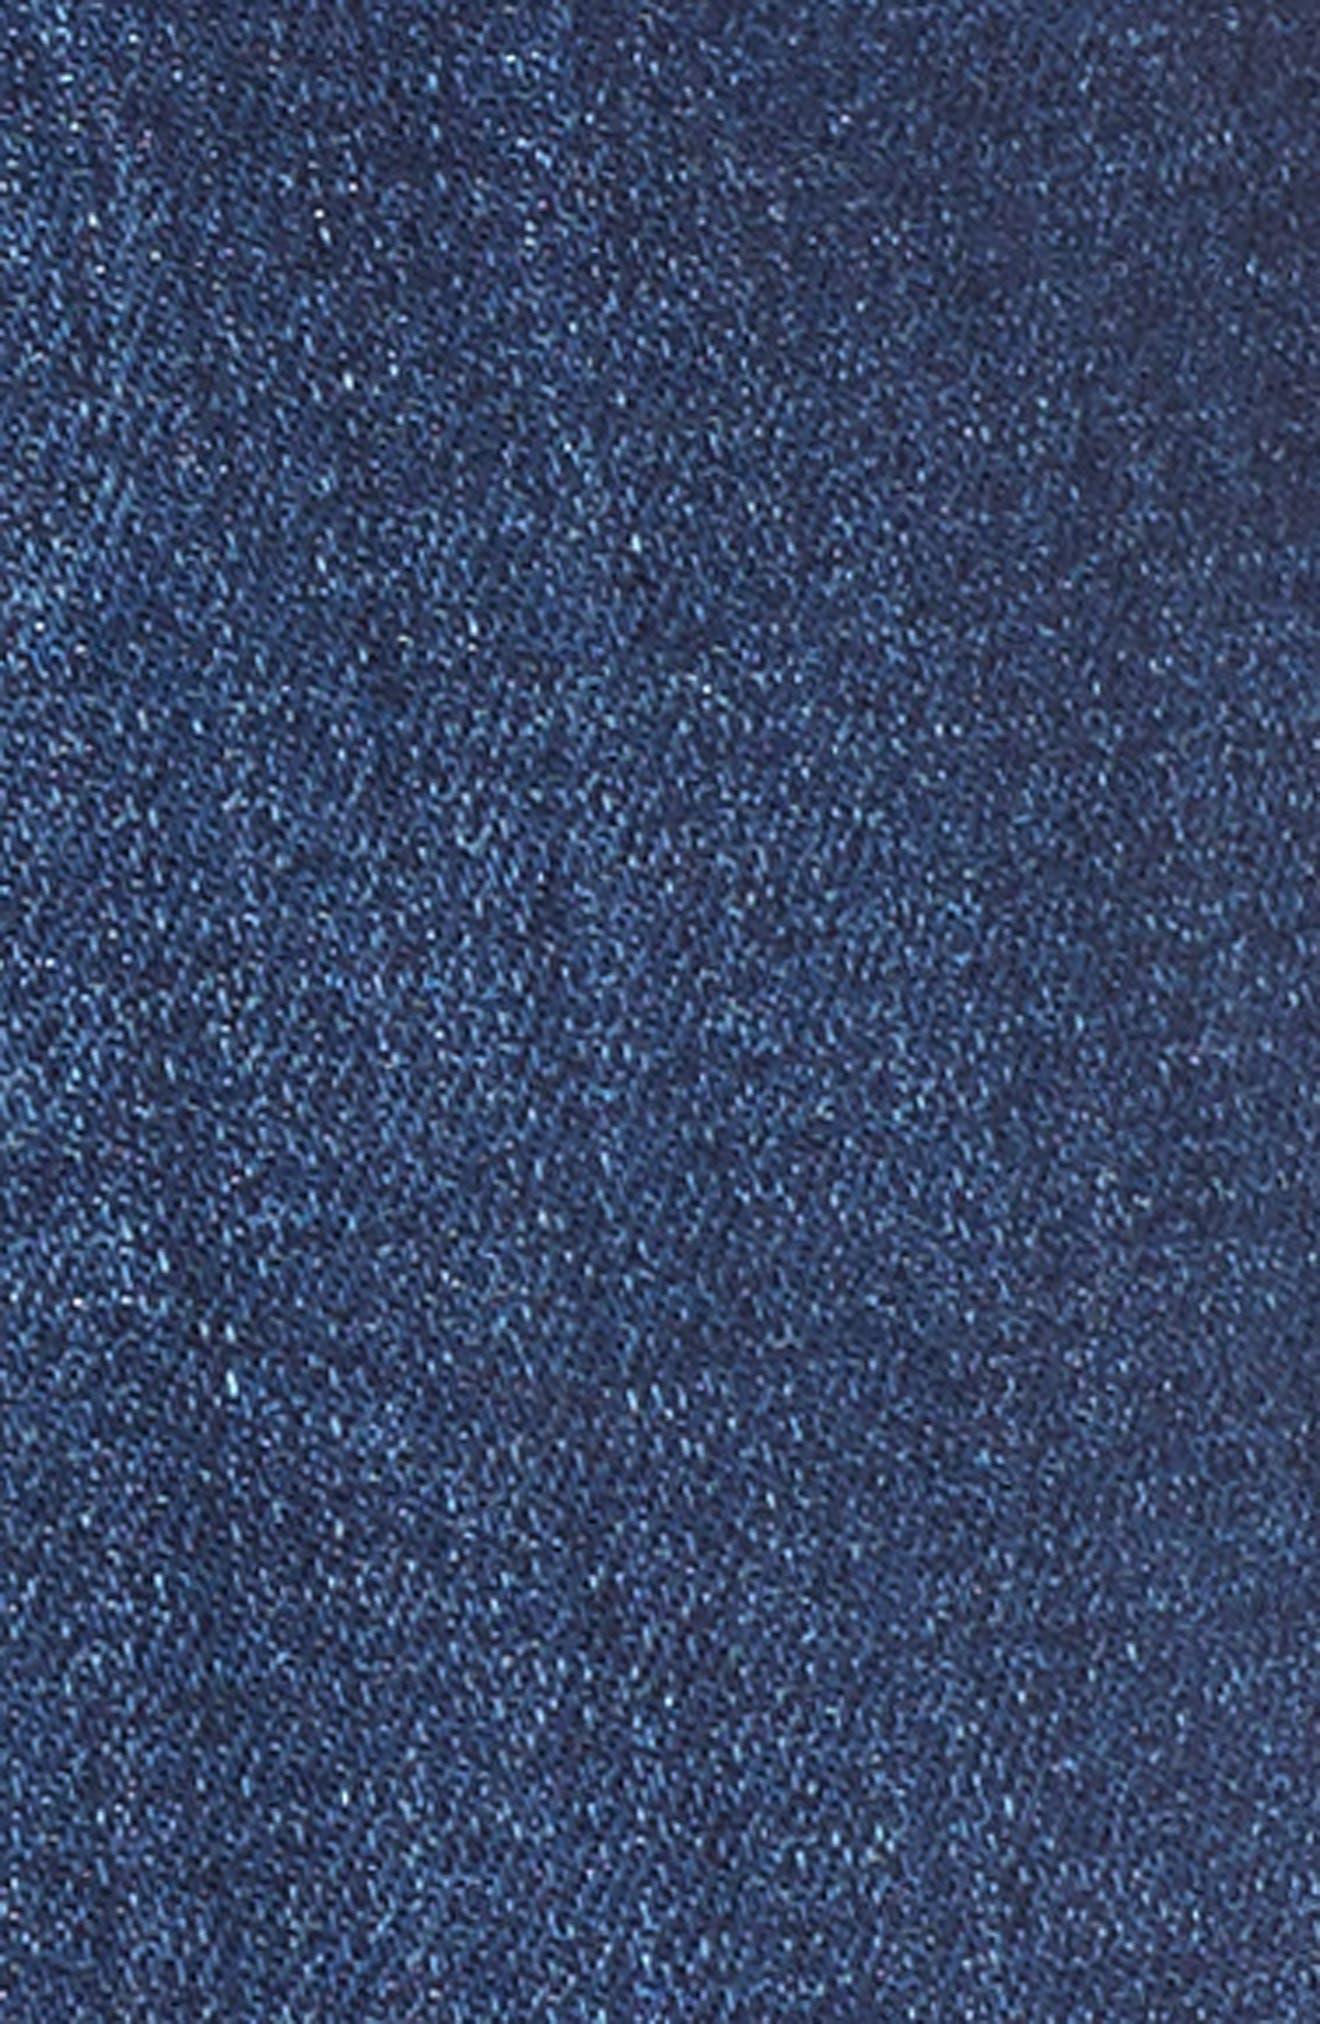 Rose Bowl Cuffed Denim Shorts,                             Alternate thumbnail 6, color,                             Sageland